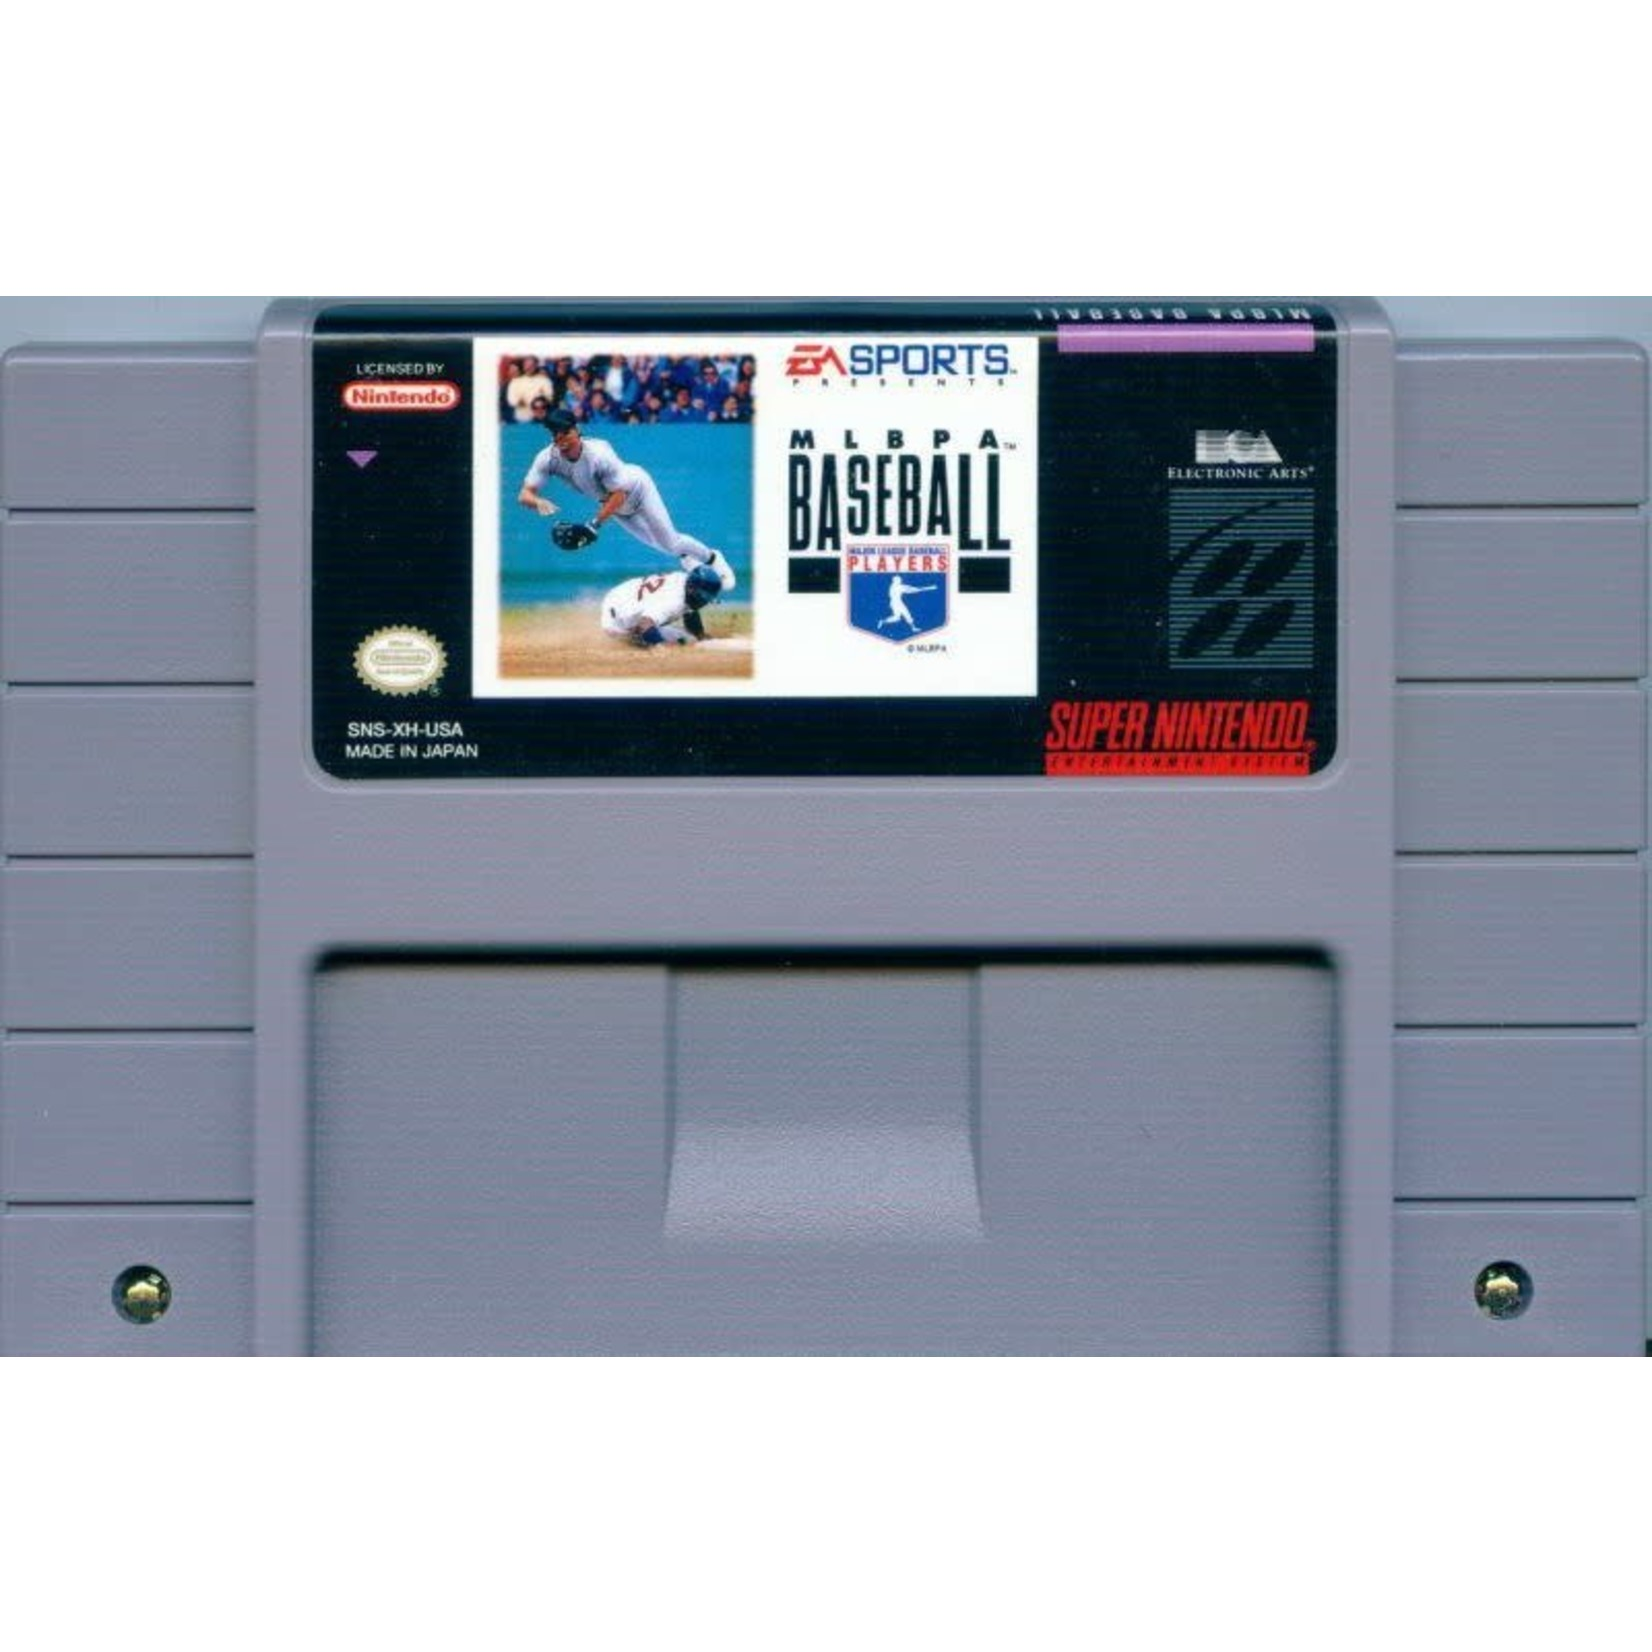 SNESU-MLBPA Baseball (Cartridge Only)